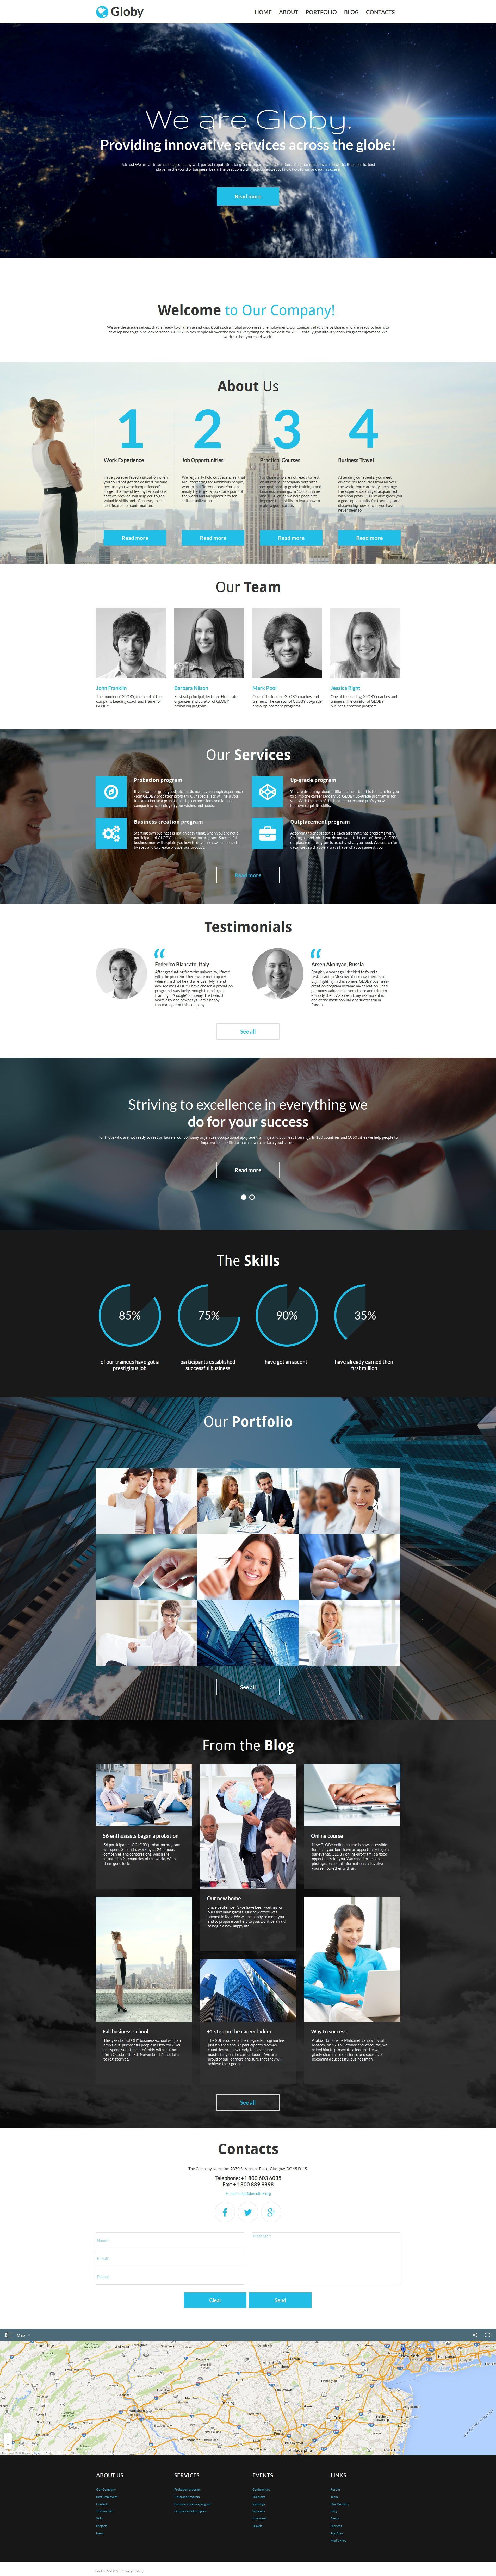 3 Business Moto CMS HTML Templates - just $49 - 58468 original